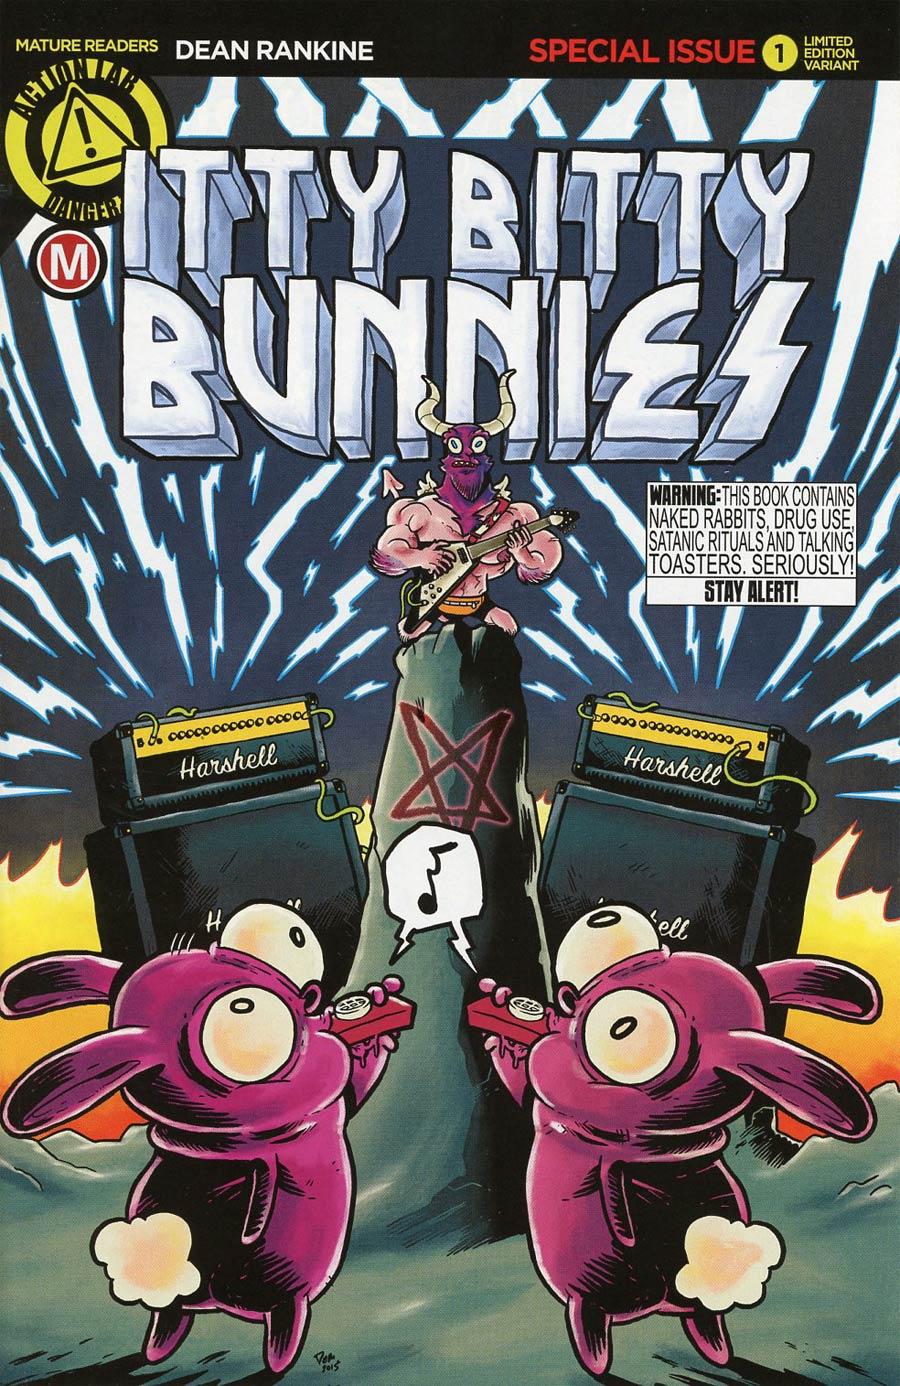 Itty Bitty Bunnies In Rainbow Pixie Candyland Pop Tarts One Shot Cover B Variant Daniel Arruda Massa Cover